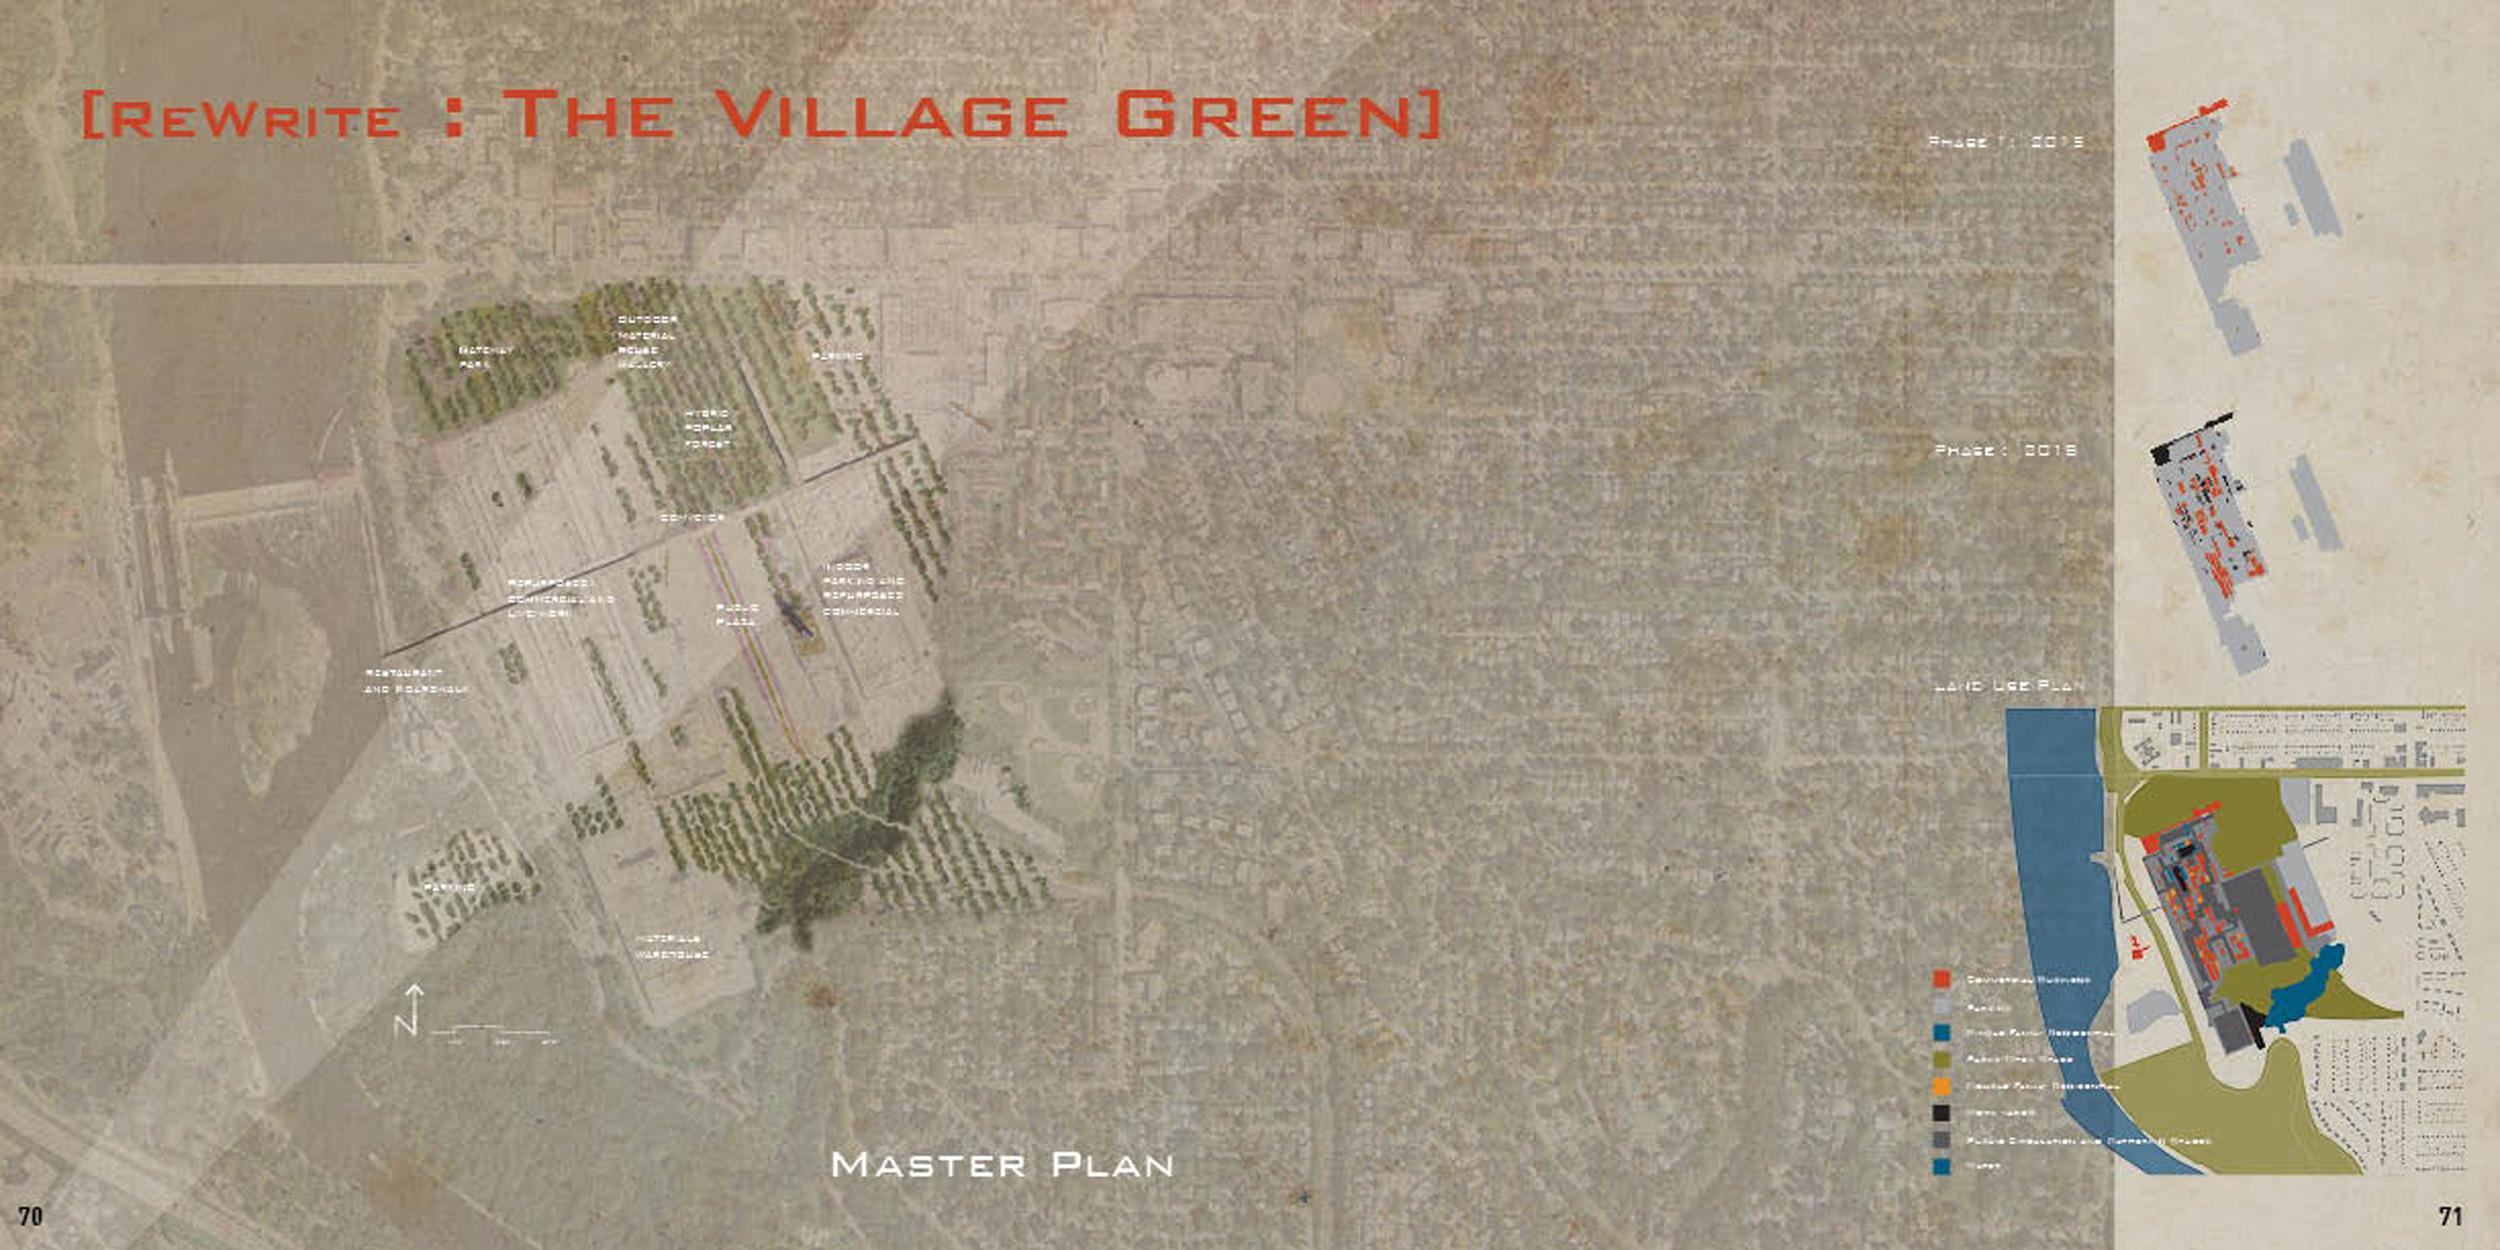 m_masterplan.jpg